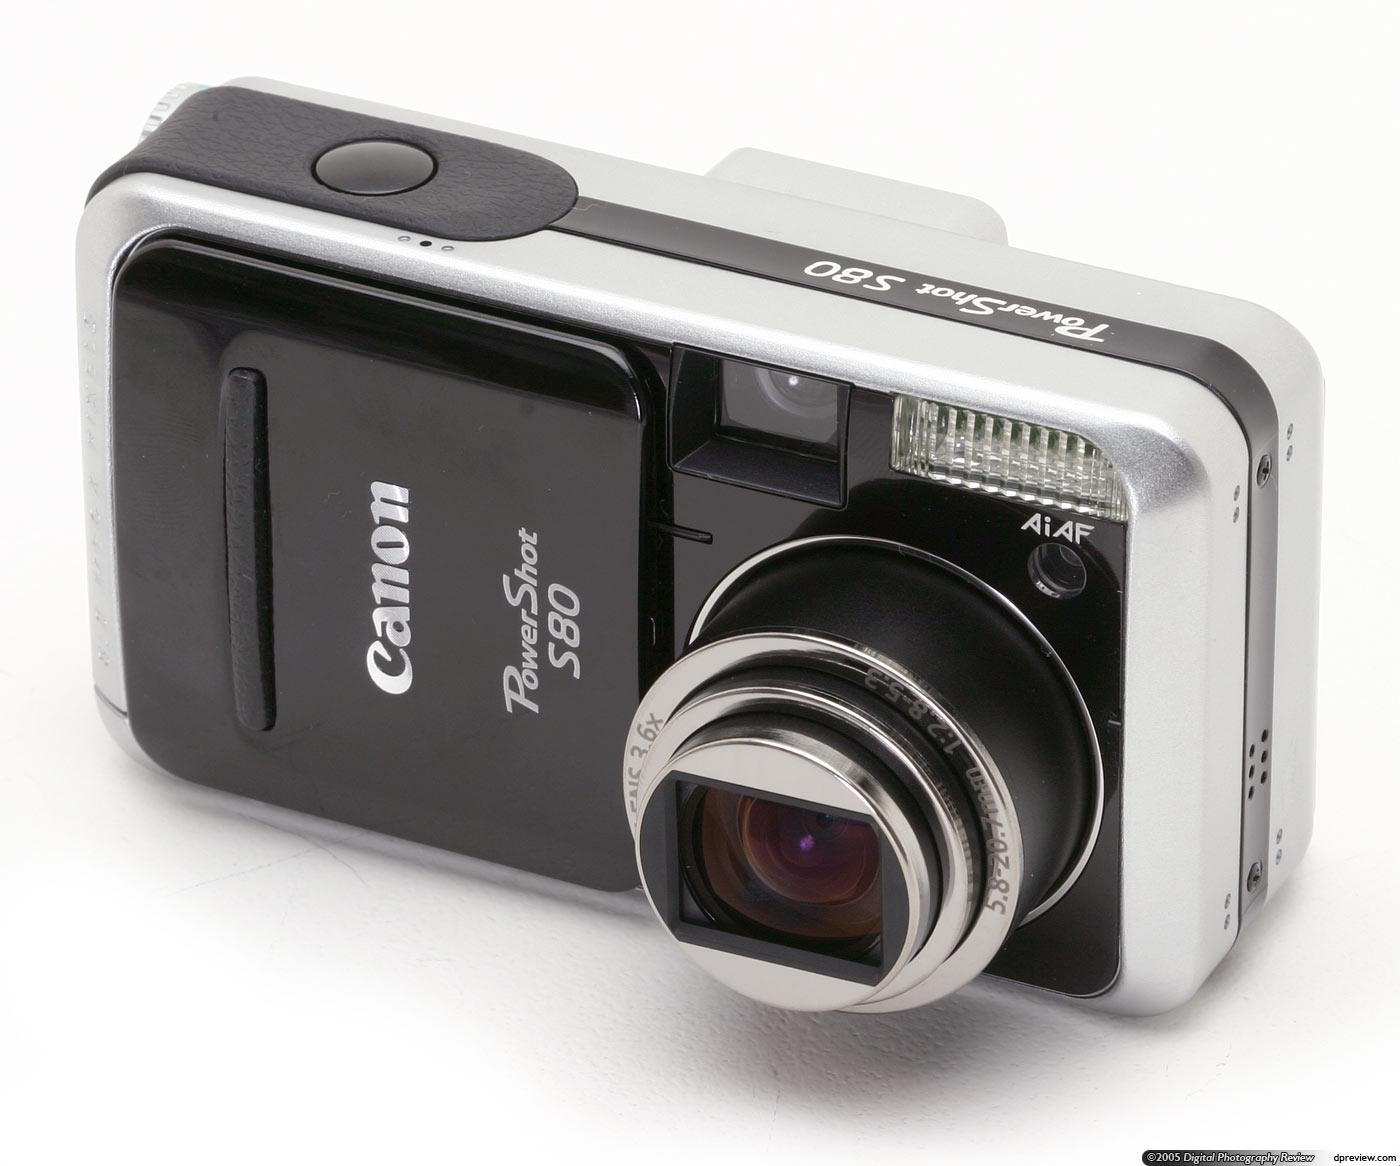 Comfy Canon Powershot Digital Camera Battery Canon Powershot Digital Camera Canon Powershot Sx410 Is Review Photographyblog Canon Powershot Sx410 Video Review dpreview Canon Powershot Sx410 Review